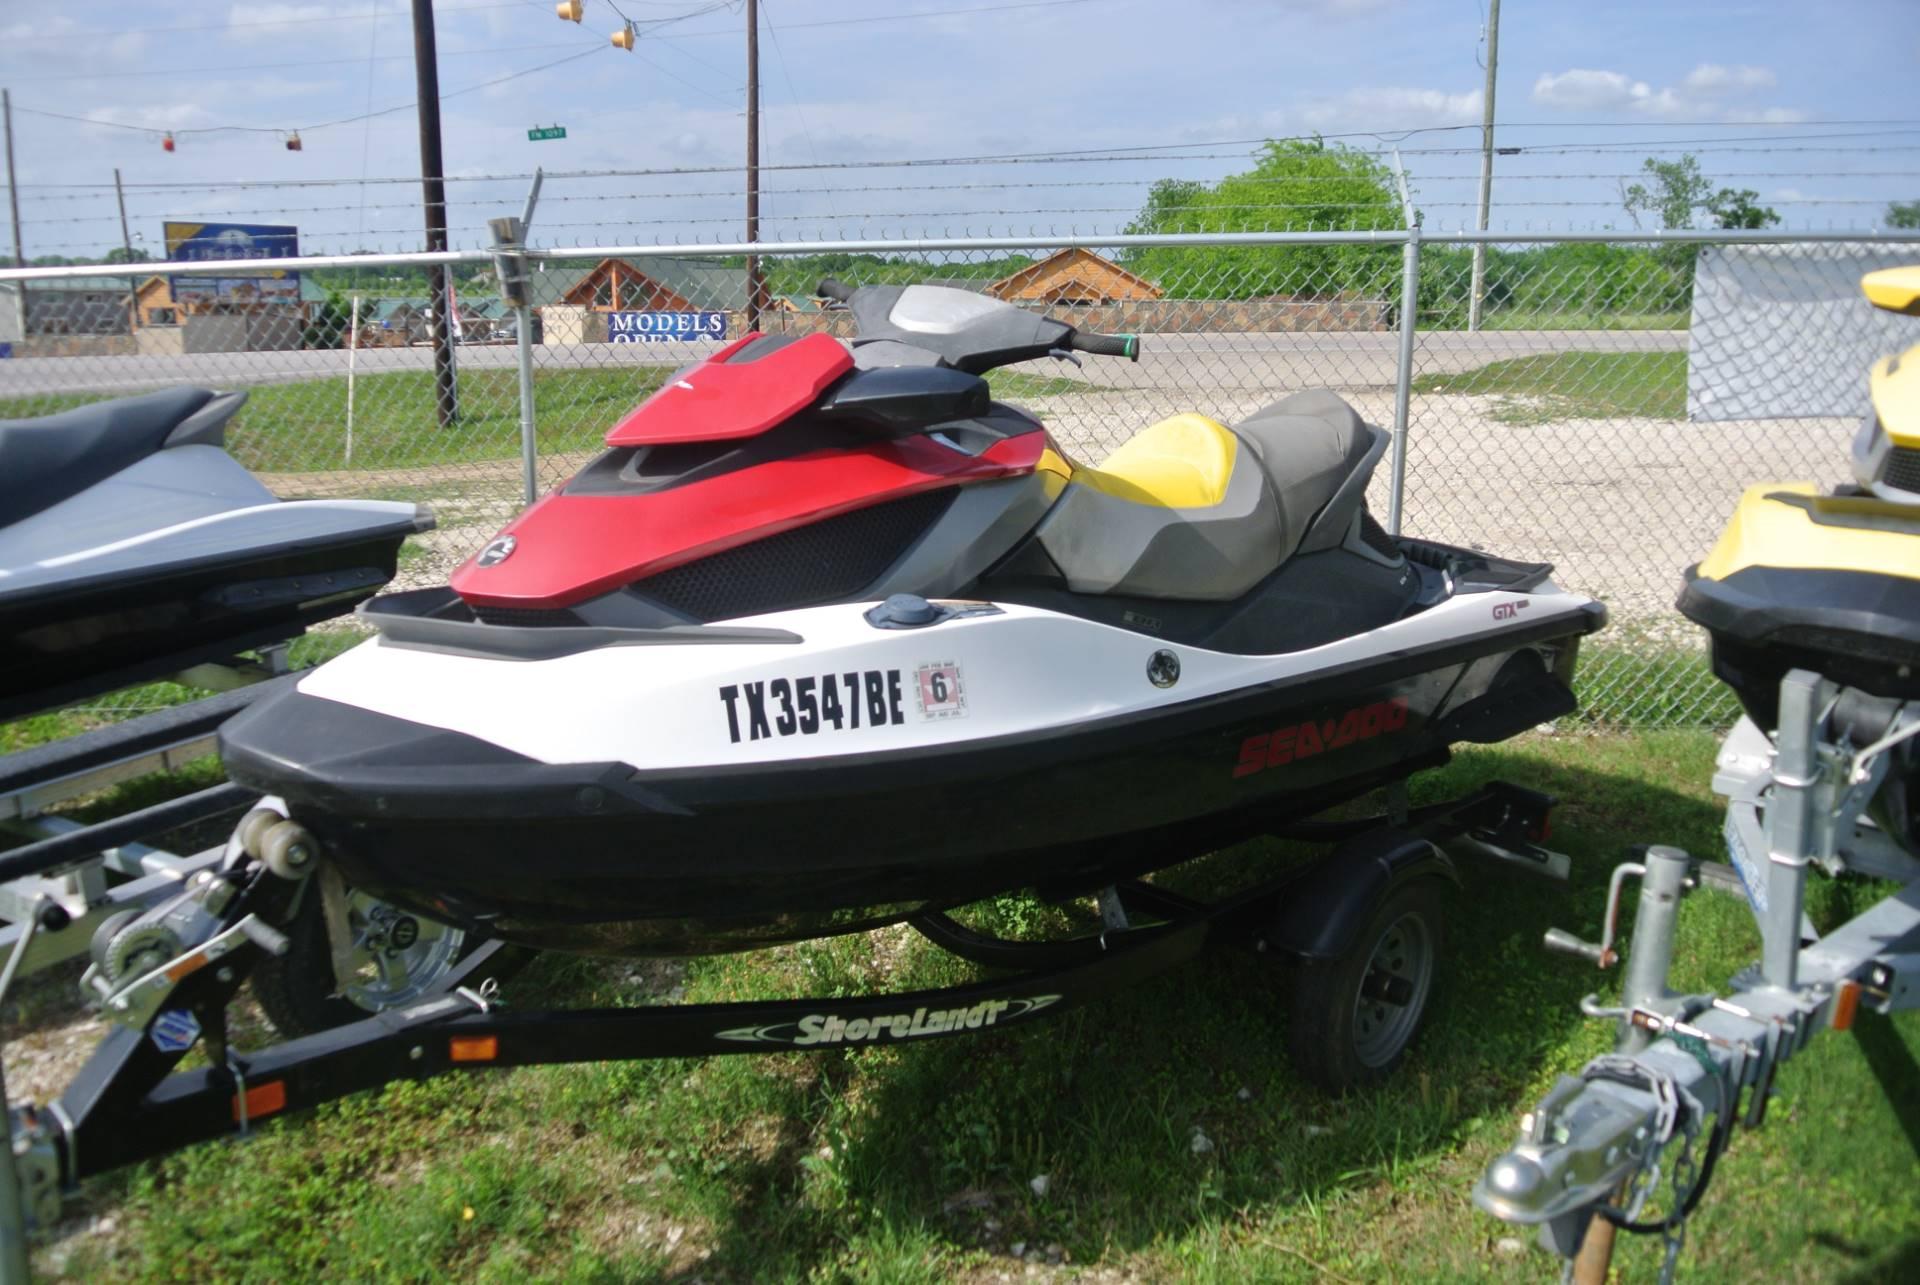 2010 Sea-Doo GTX iS™ 215 in Willis, Texas